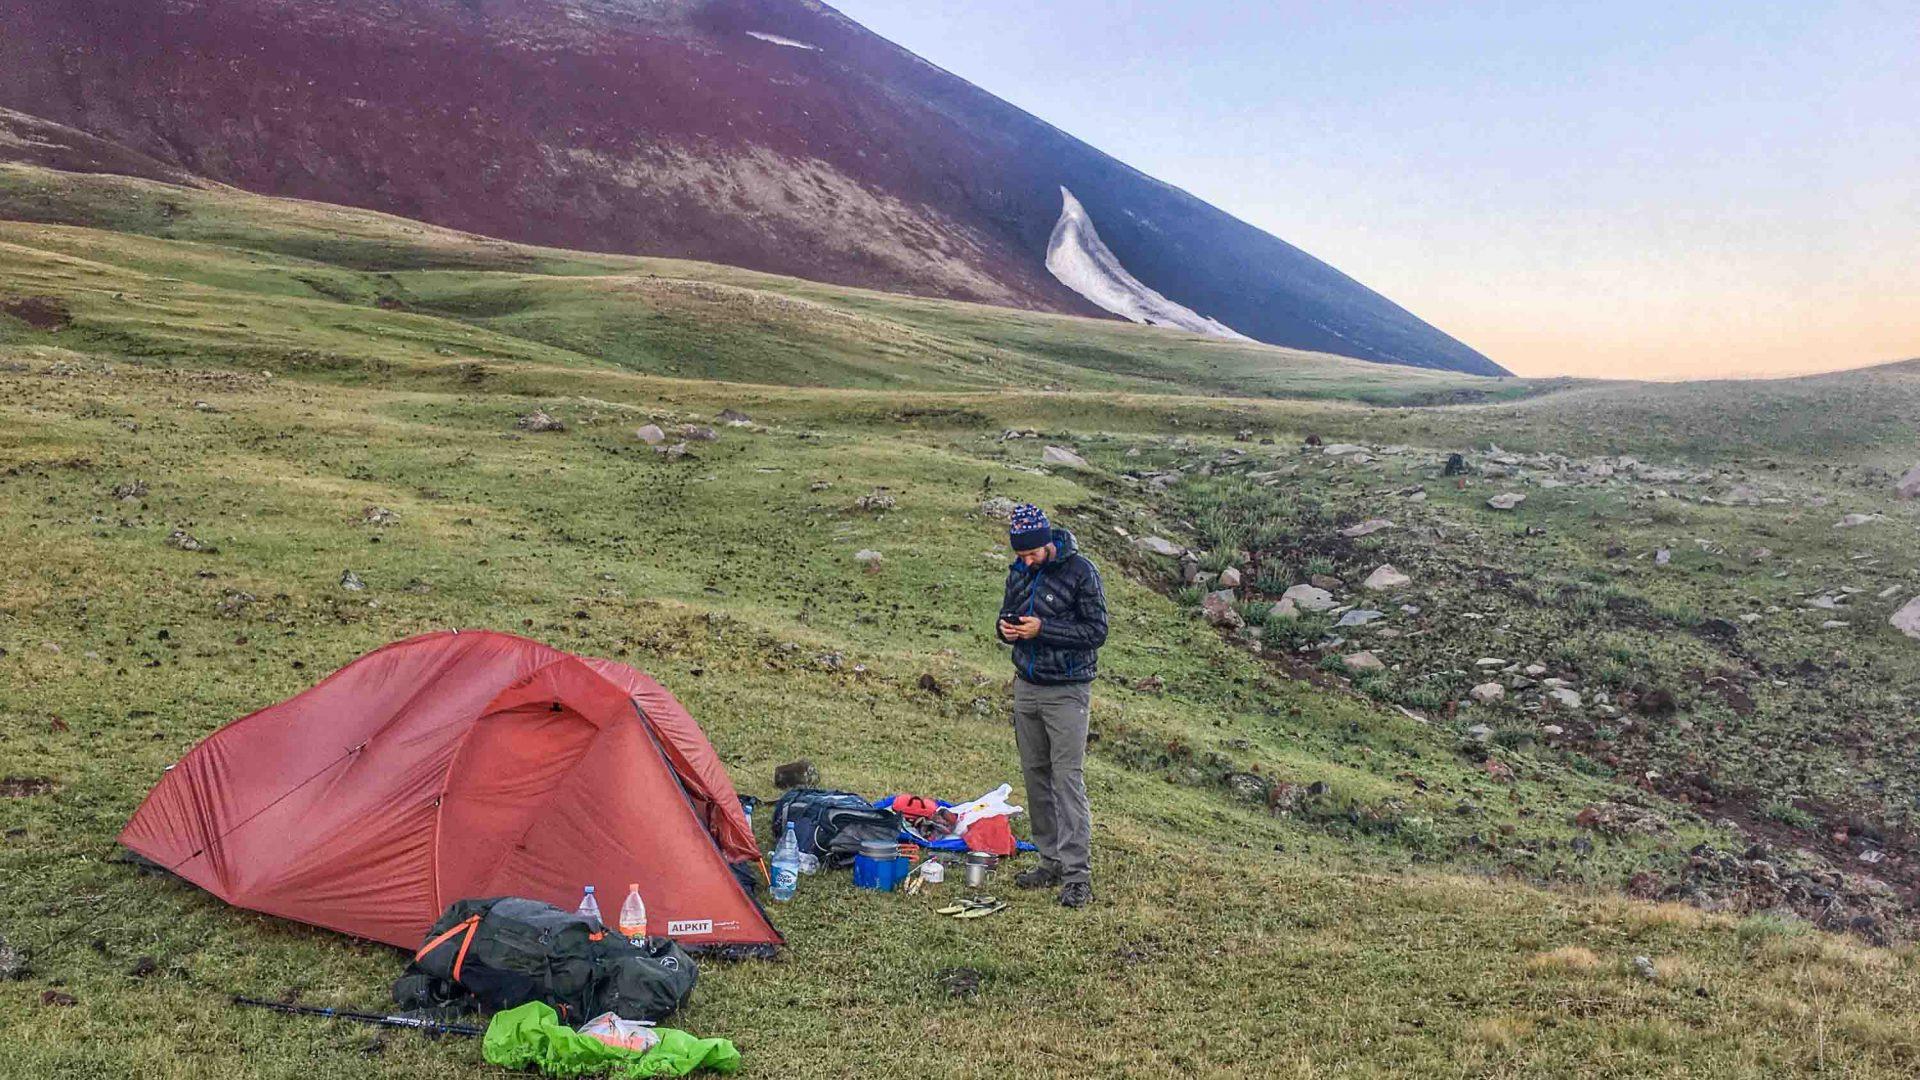 Campsite on Azdahak mountain the morning before the summit push.